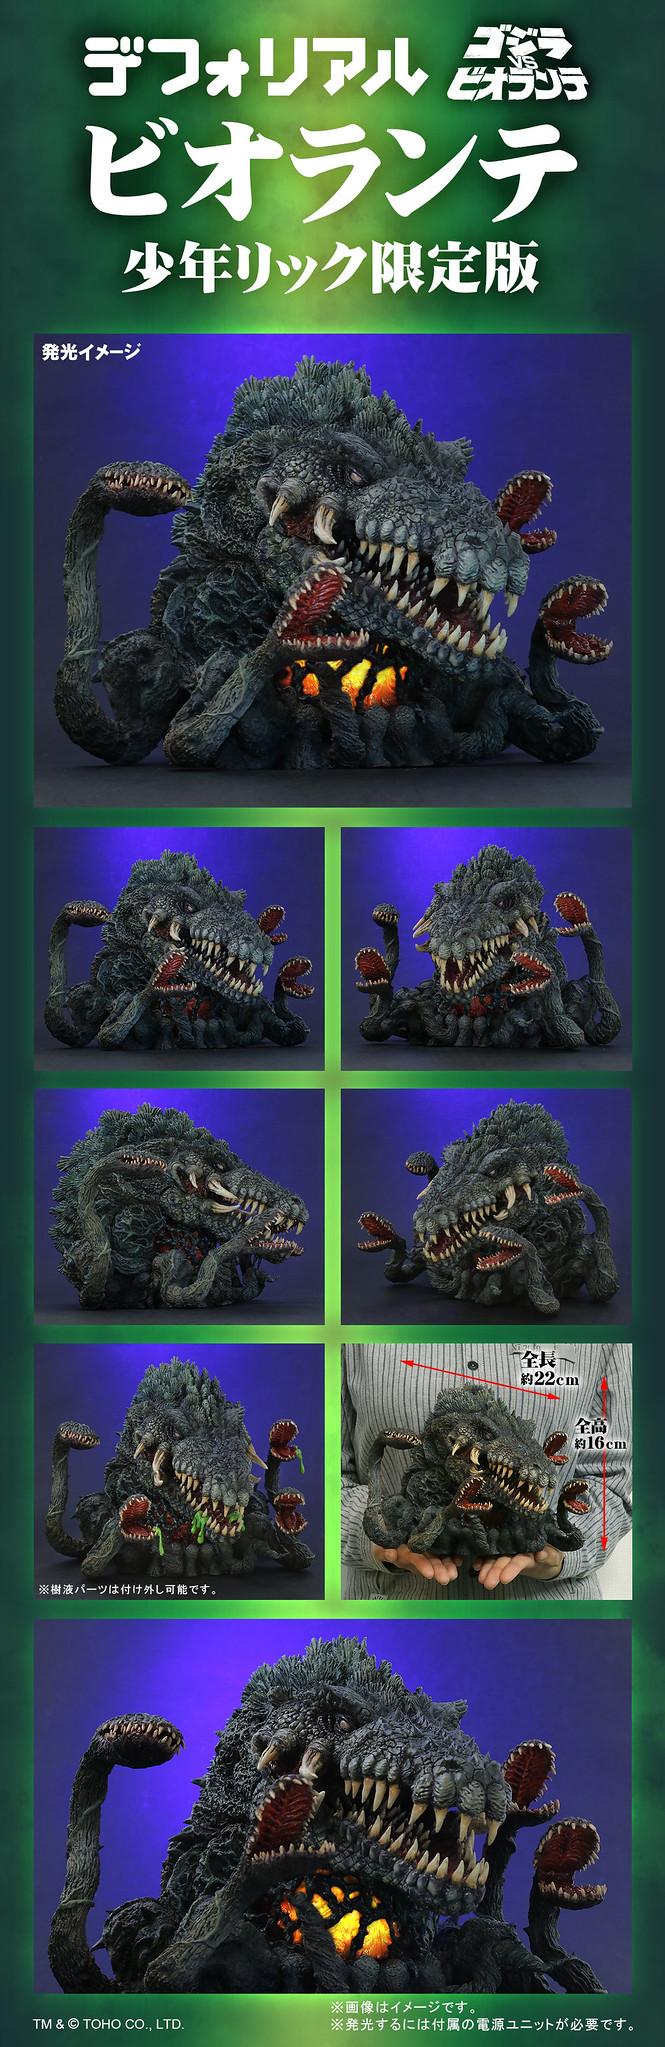 X-PLUS「DEFOREAL 碧奧蘭蒂」07月發售  再現超兇猛植獸型態!